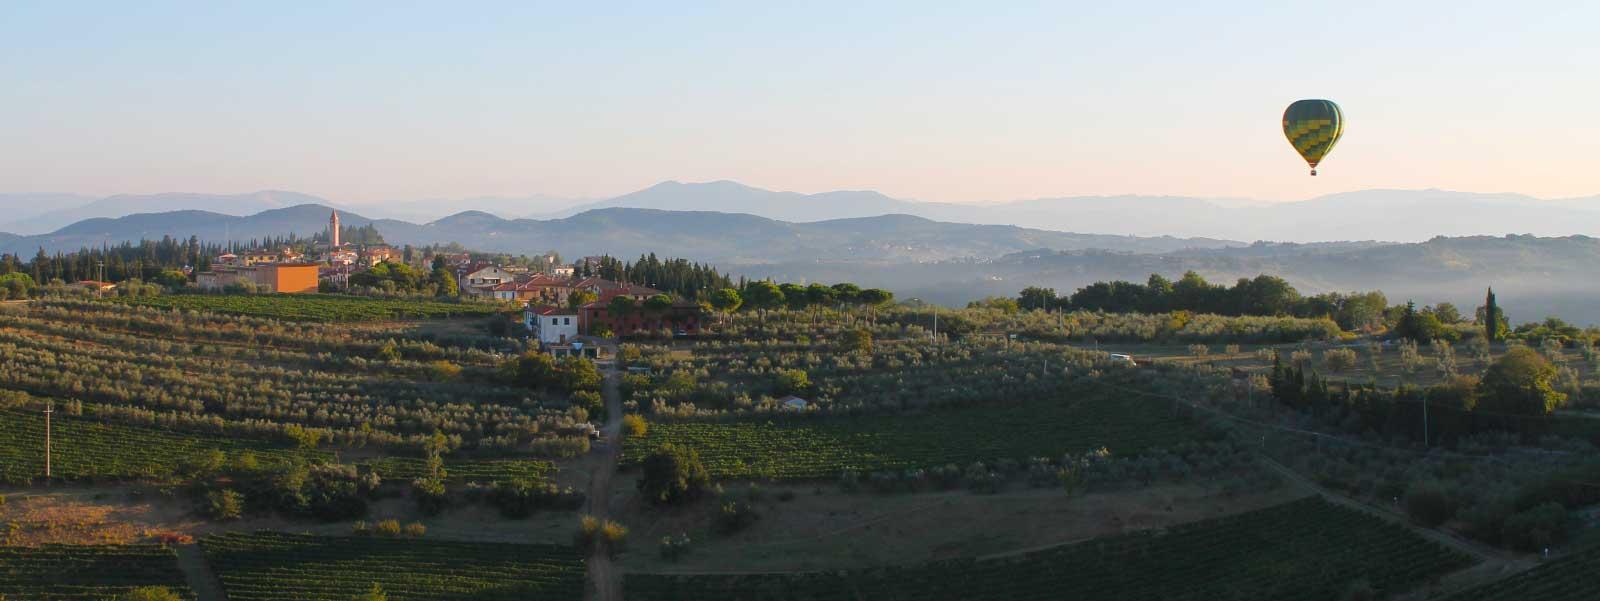 Chianti-countryside-balloon